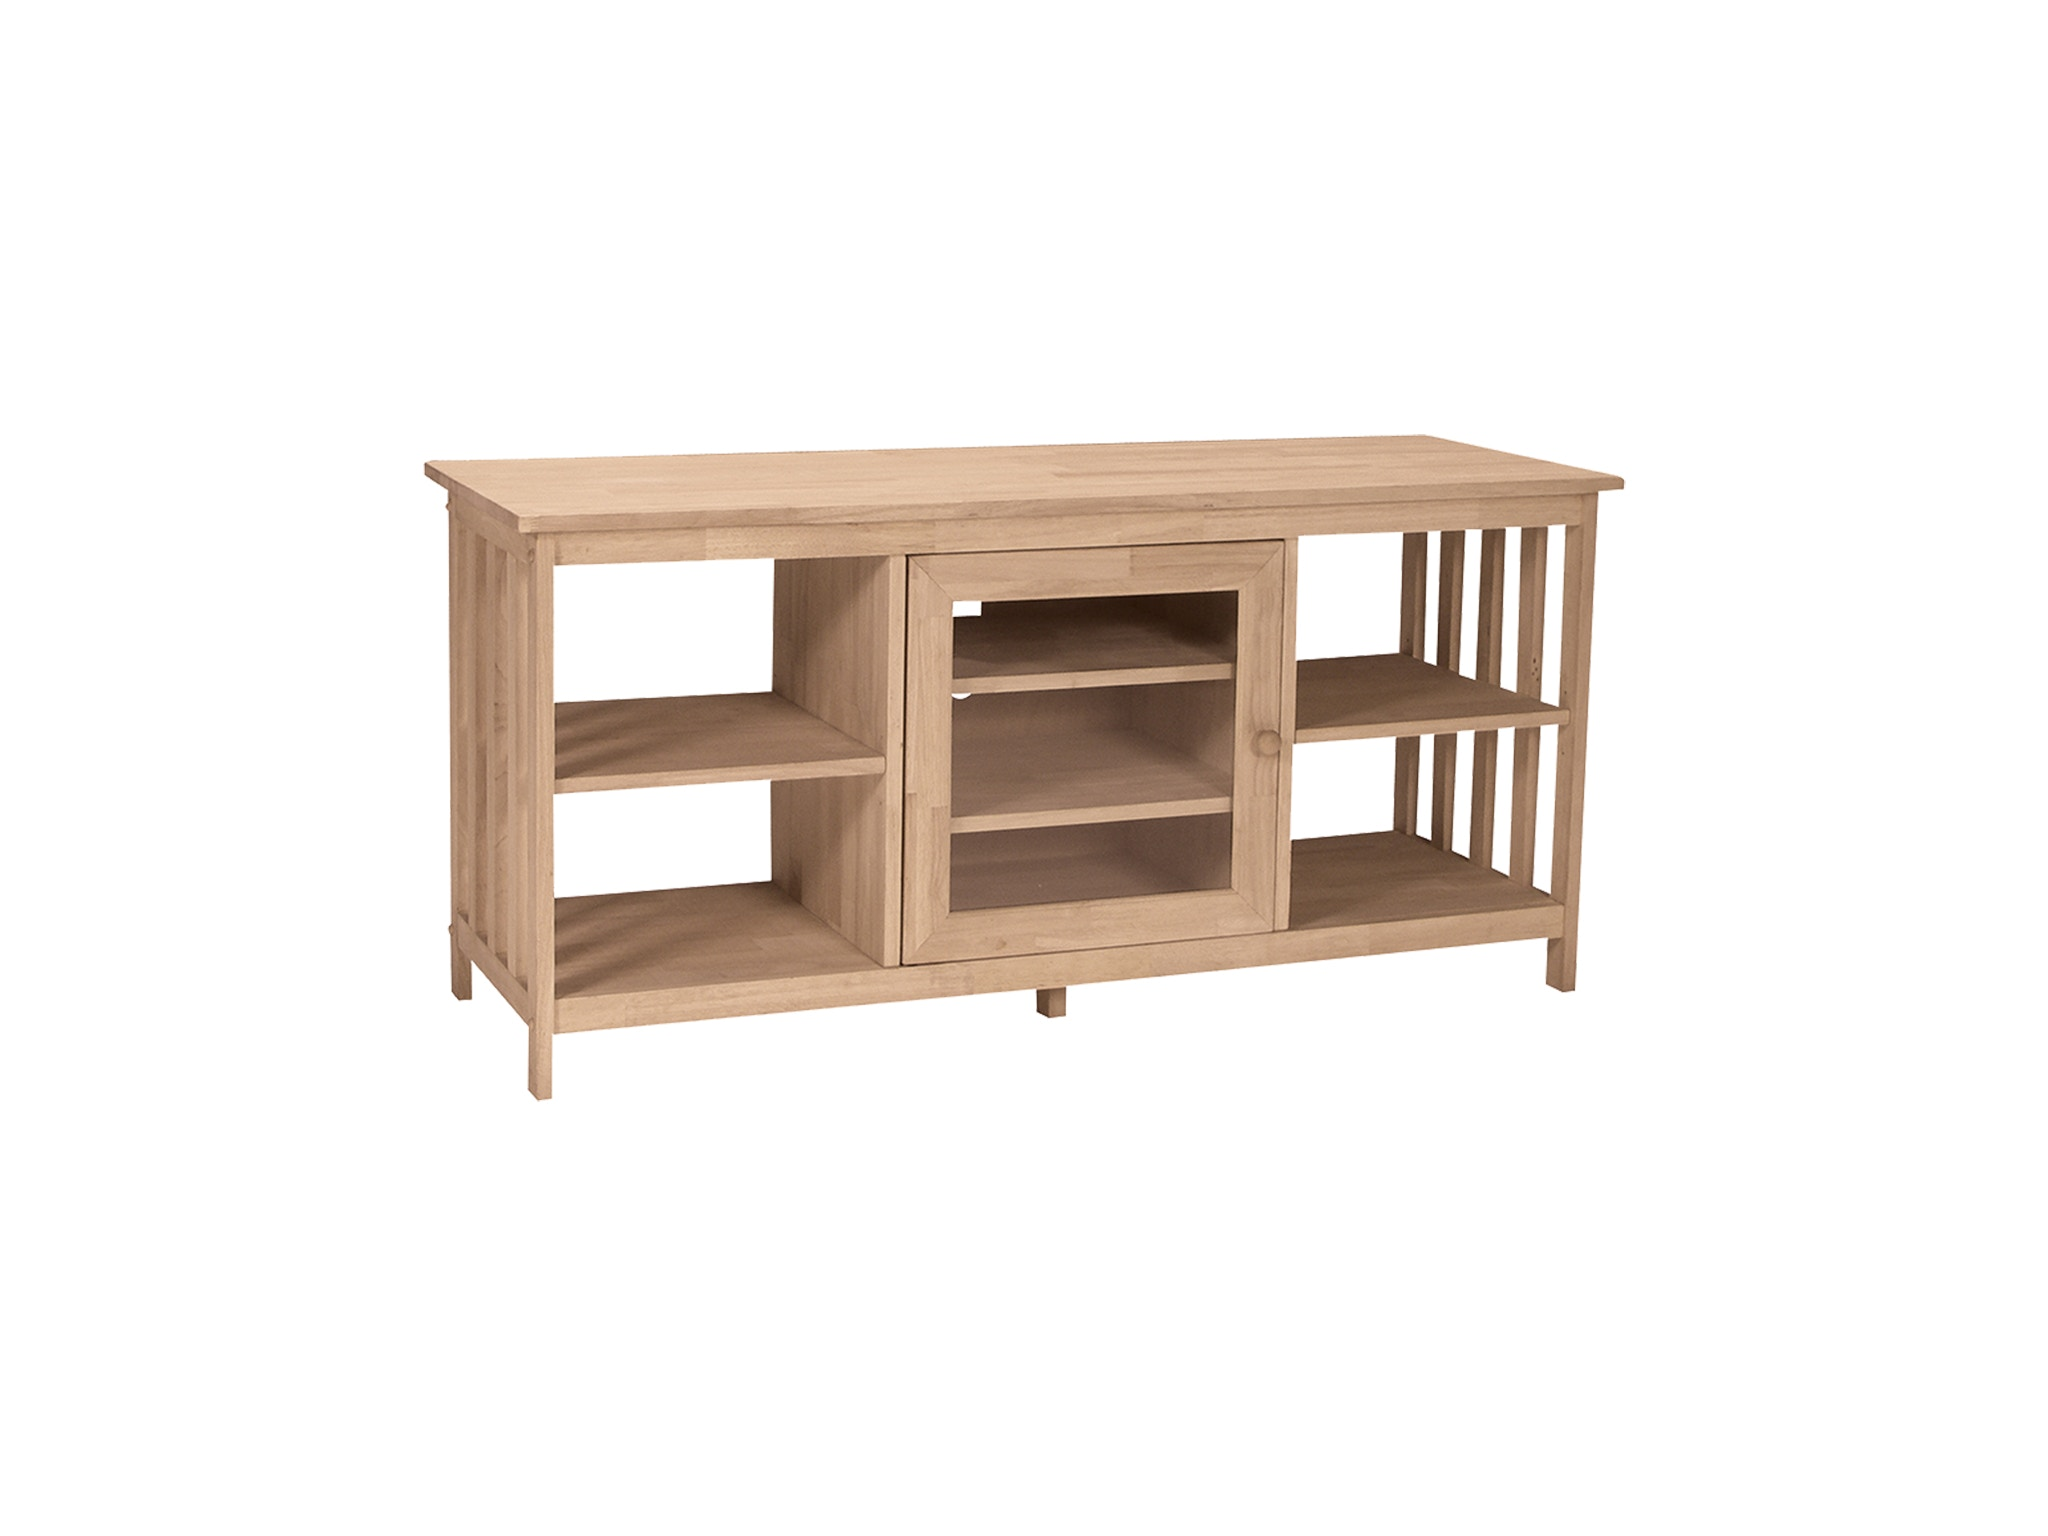 John Thomas Home Entertainment Mission Entertainment Stand<br><br>Four adjustable shelves